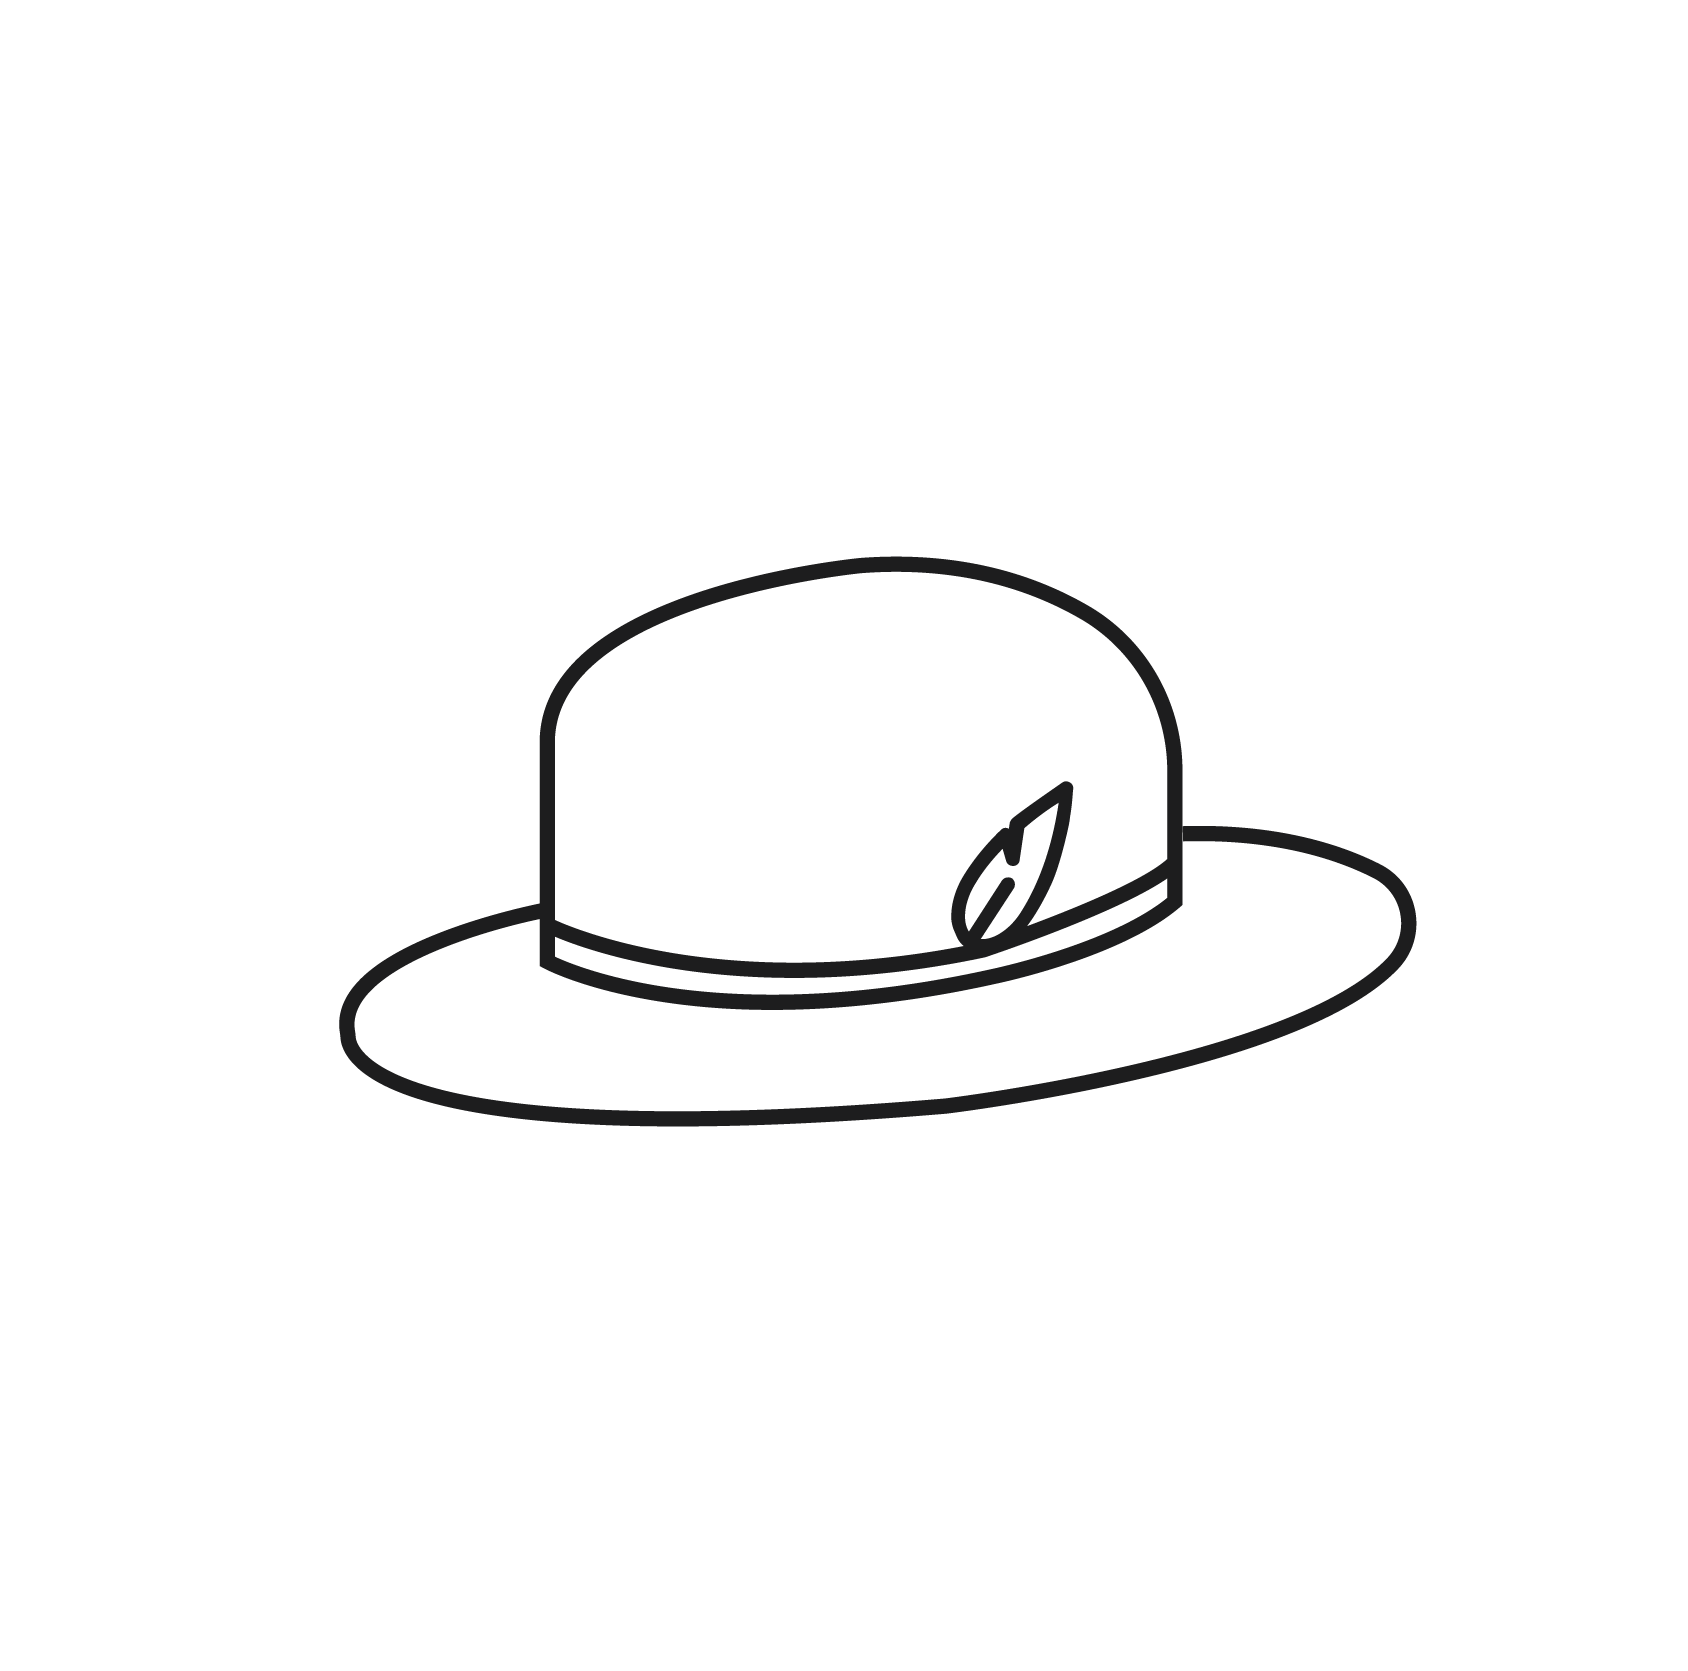 NJB Hat Black 04.png